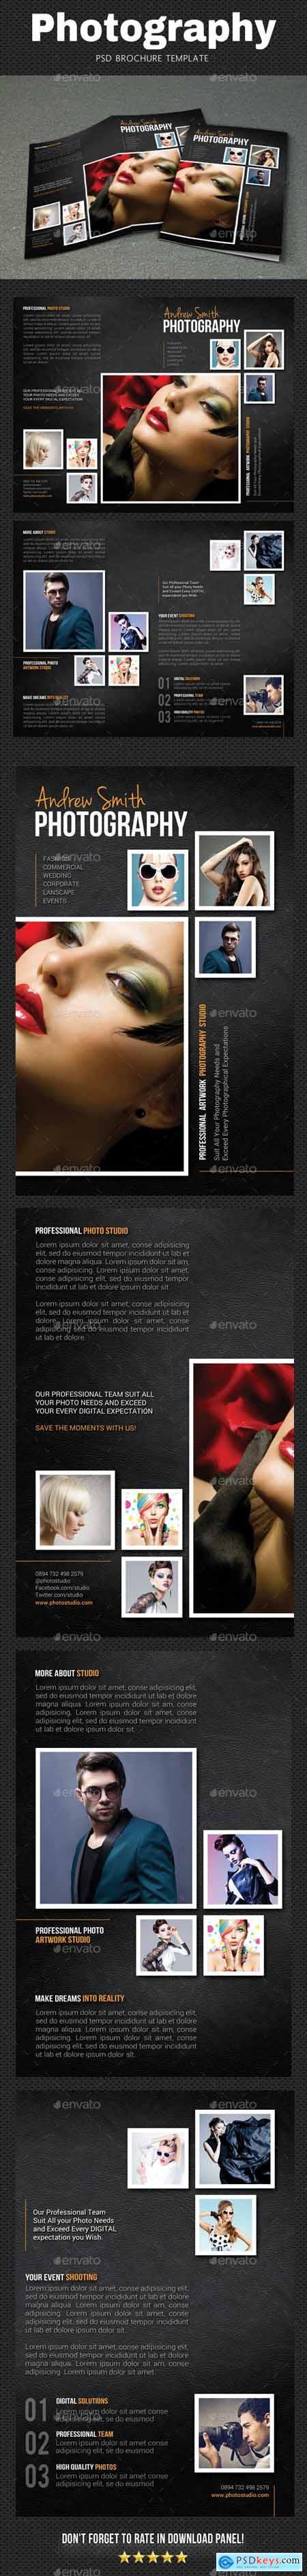 Photography Brochure 4 21262208